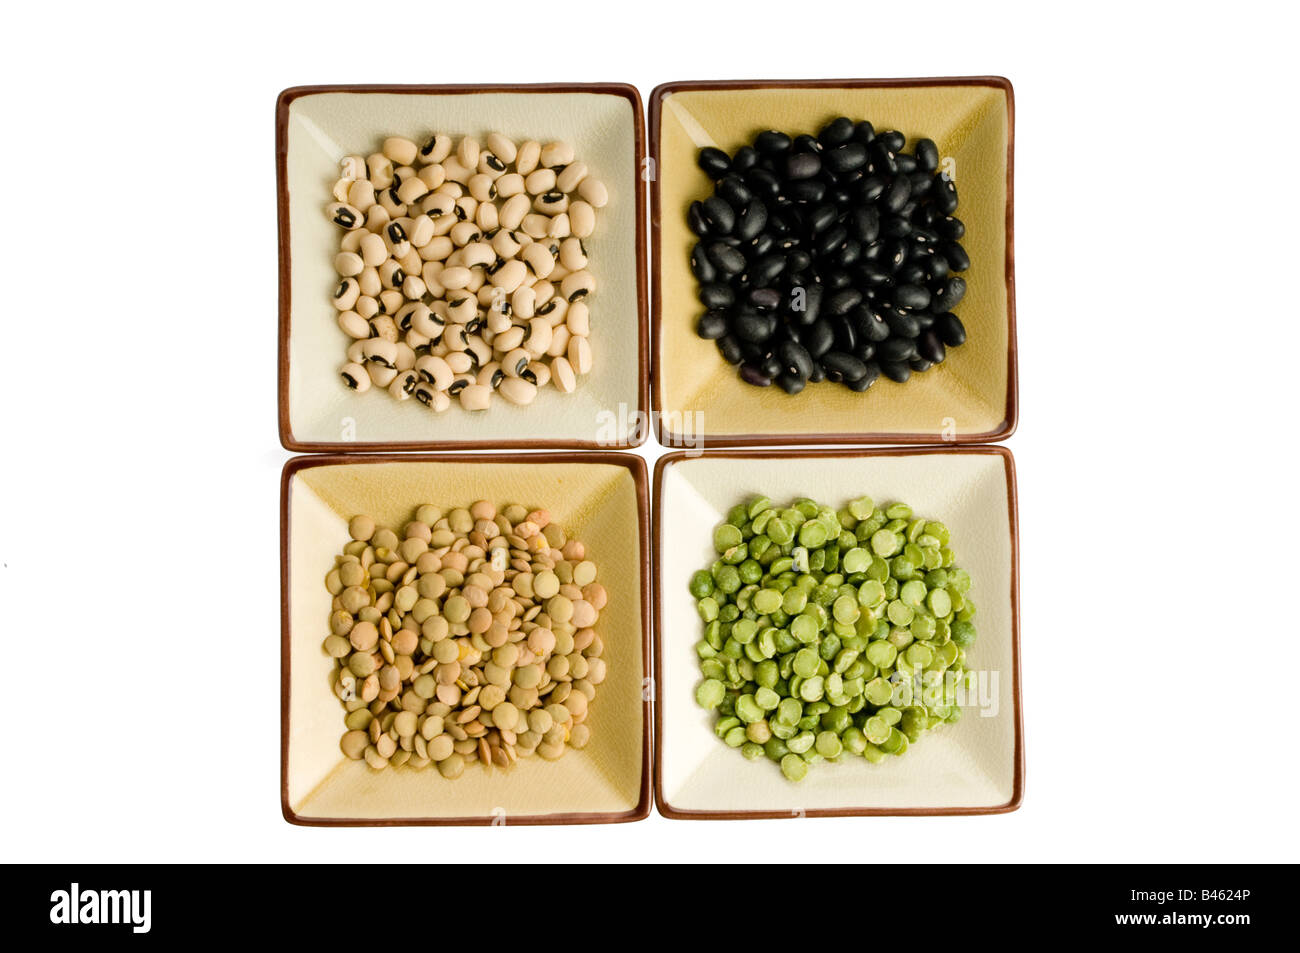 Four plates with lentils, black beans, black eyed peas, split peas - Stock Image